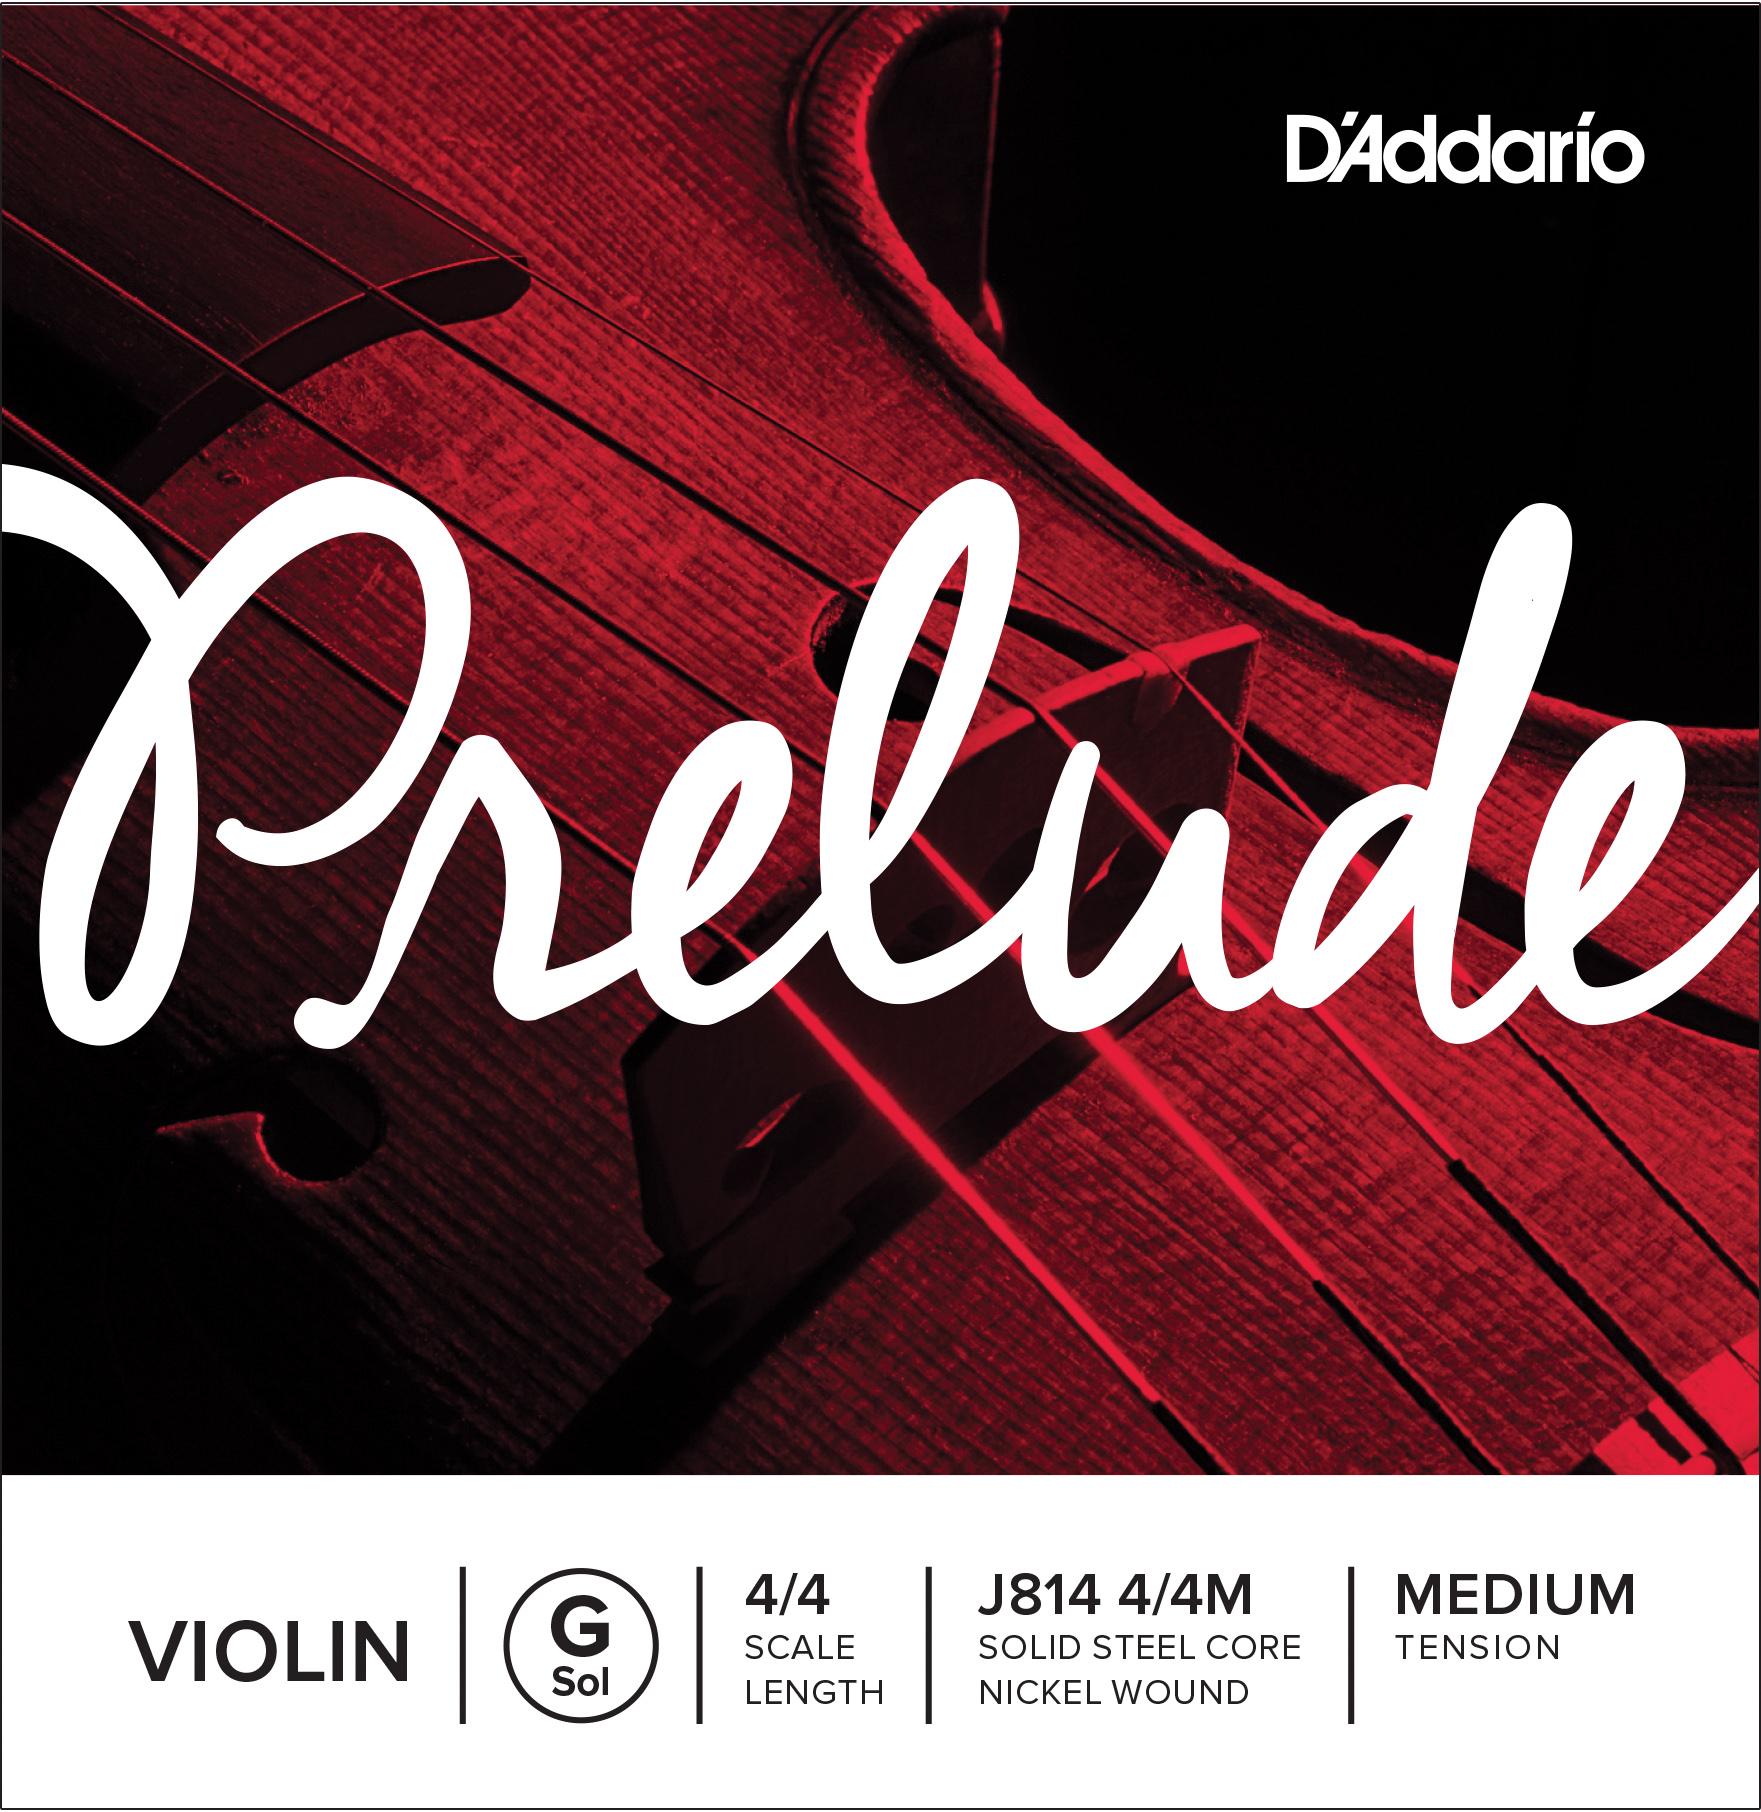 D'Addario Prelude Violin Single G String, 4/4 Scale, Medium Tension